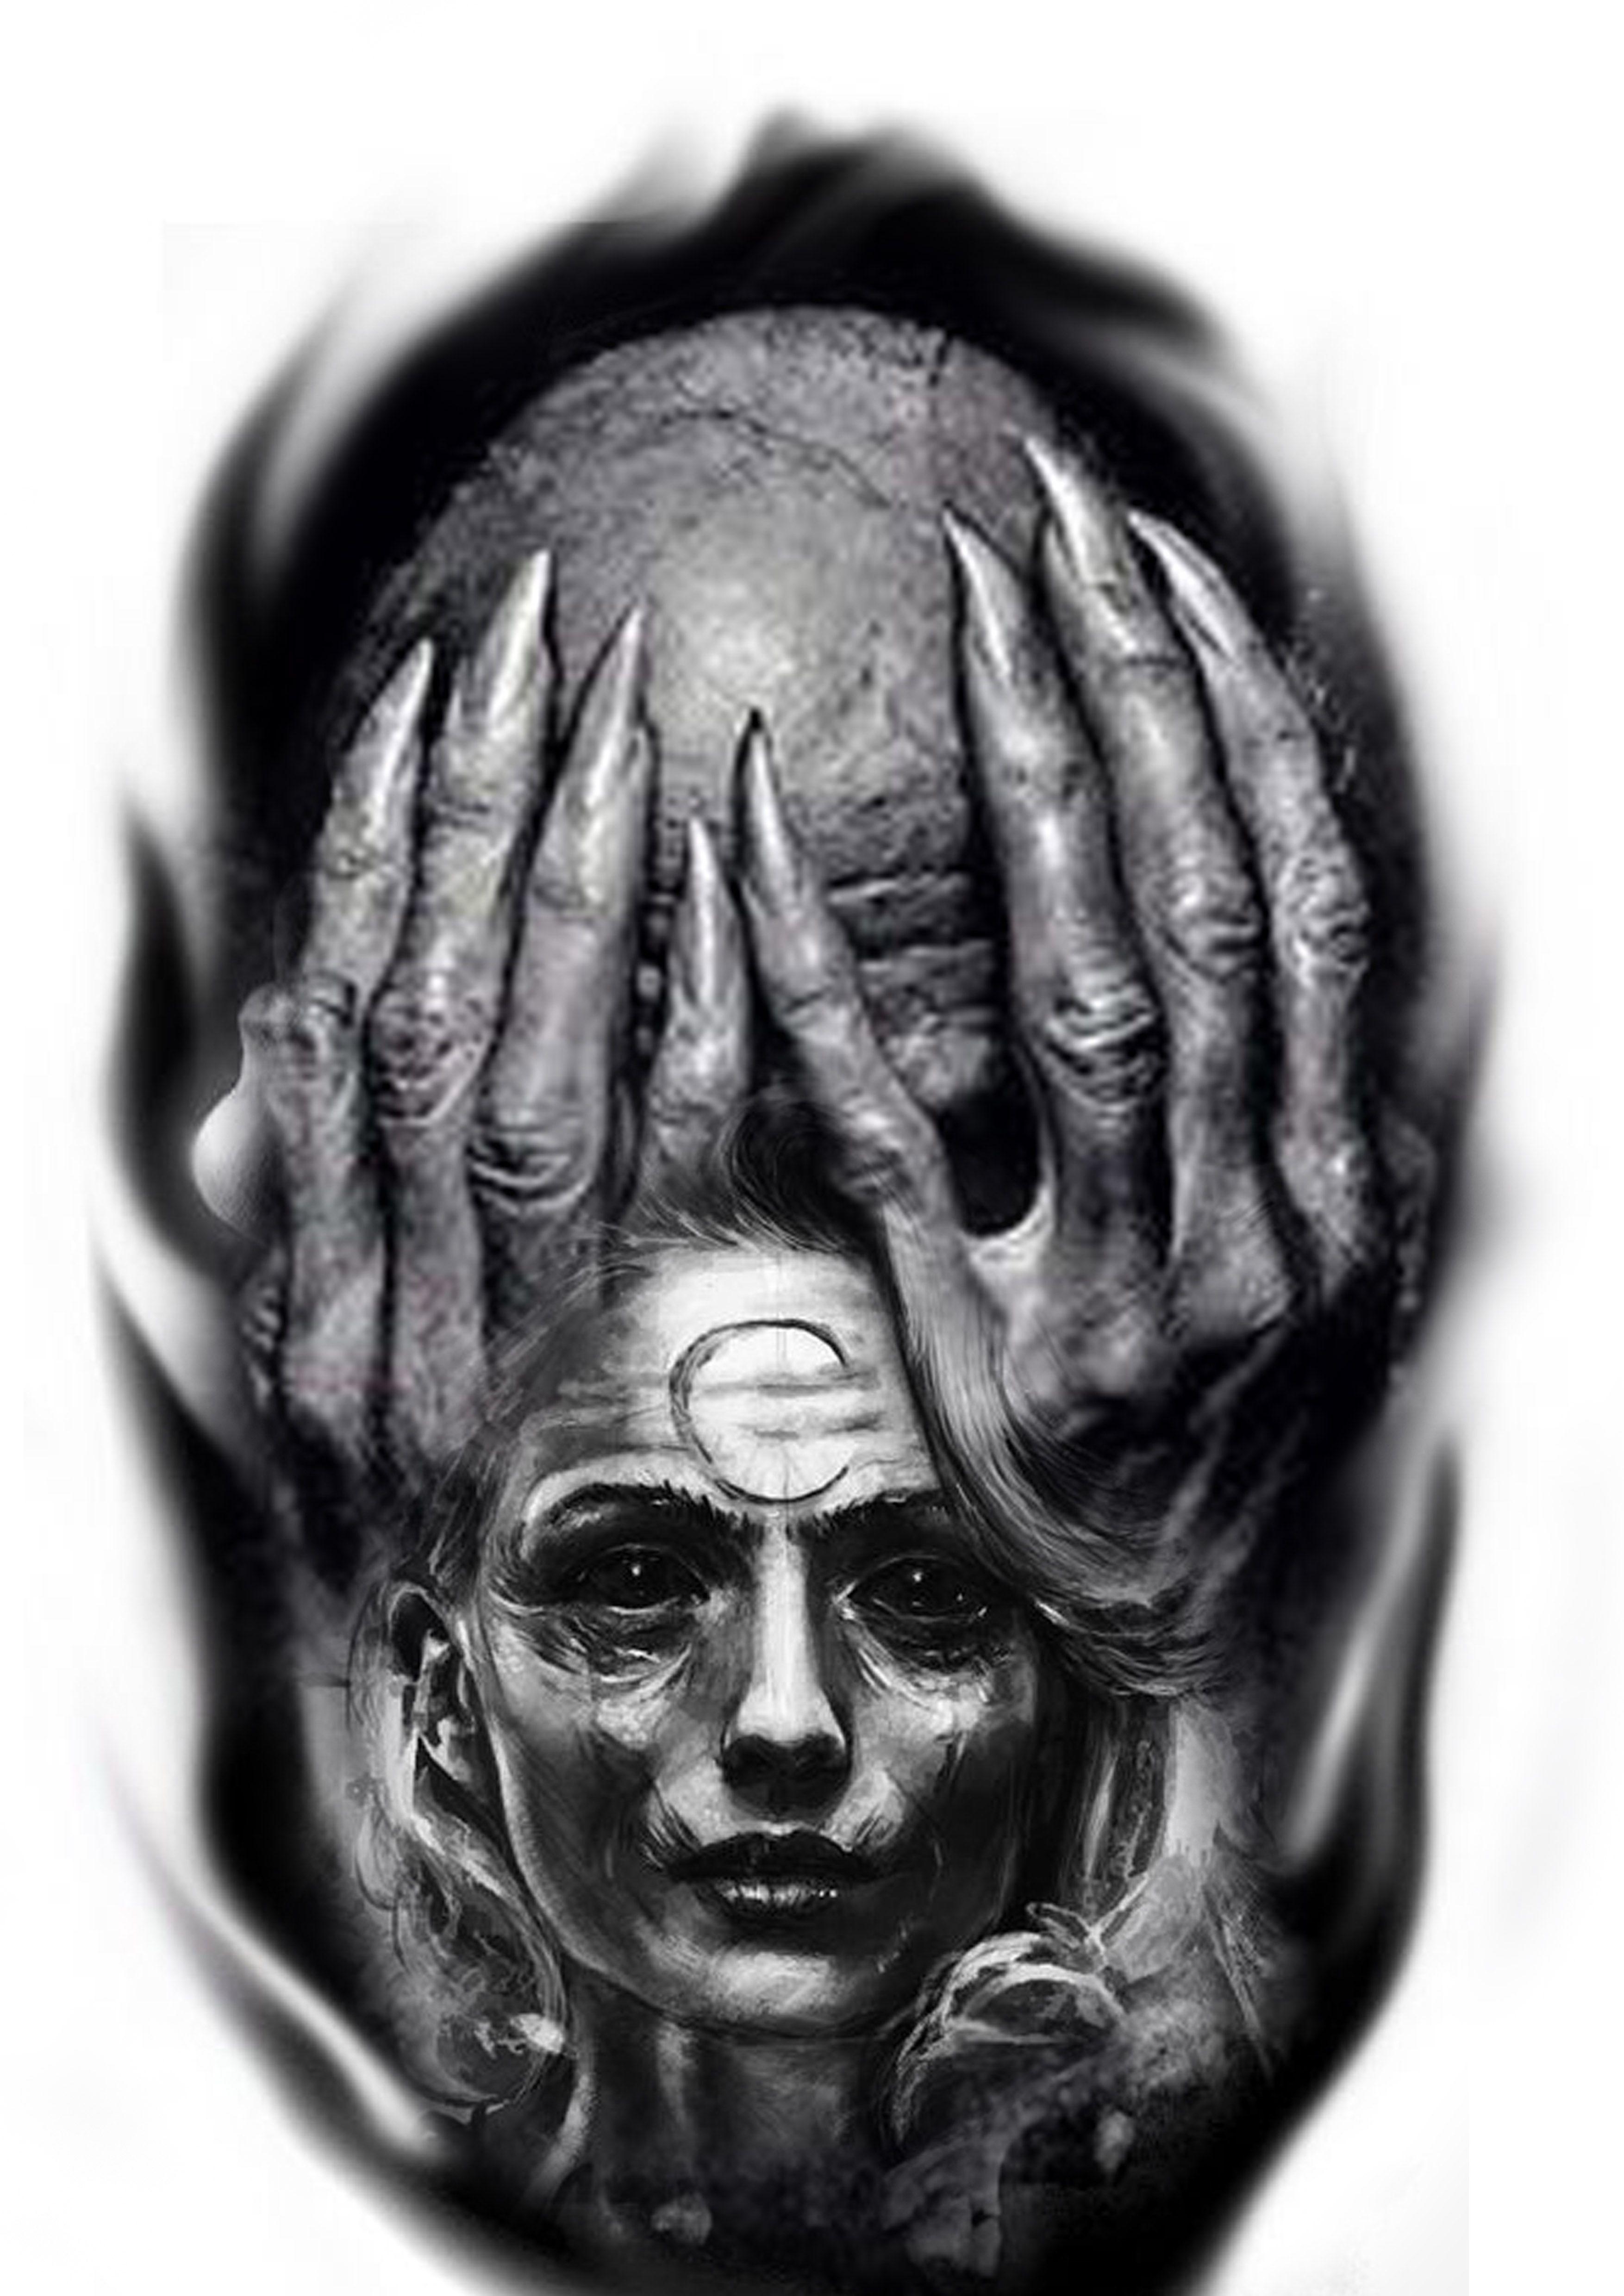 Black and white tattoo ideas pin by dark virus on tattoo  pinterest  tattoo tattoo designs and